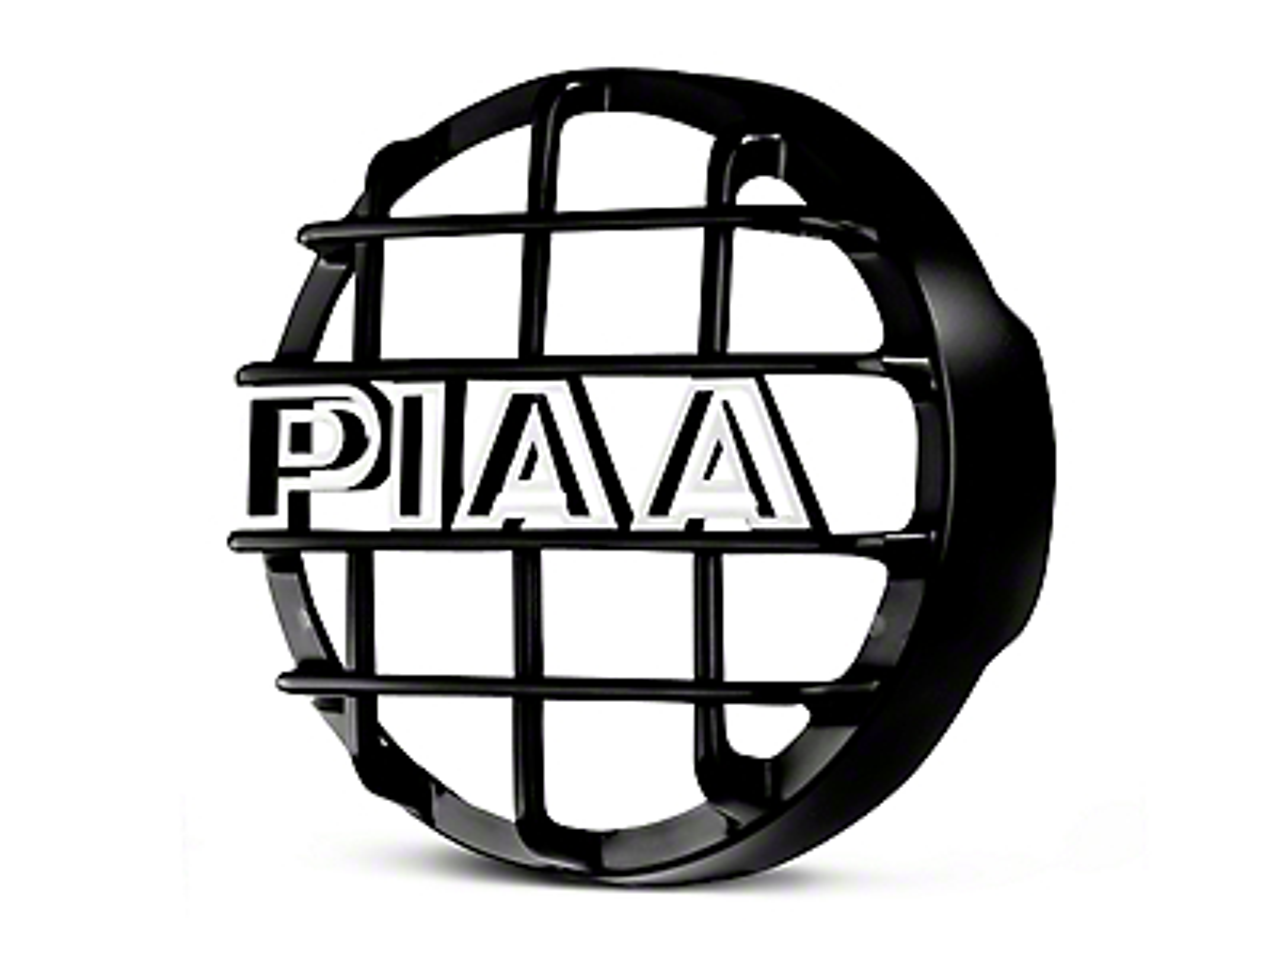 PIAA 540 Series 5 in. Round Black Mesh Grille w/ PIAA Logo (07-18 Sierra 1500)